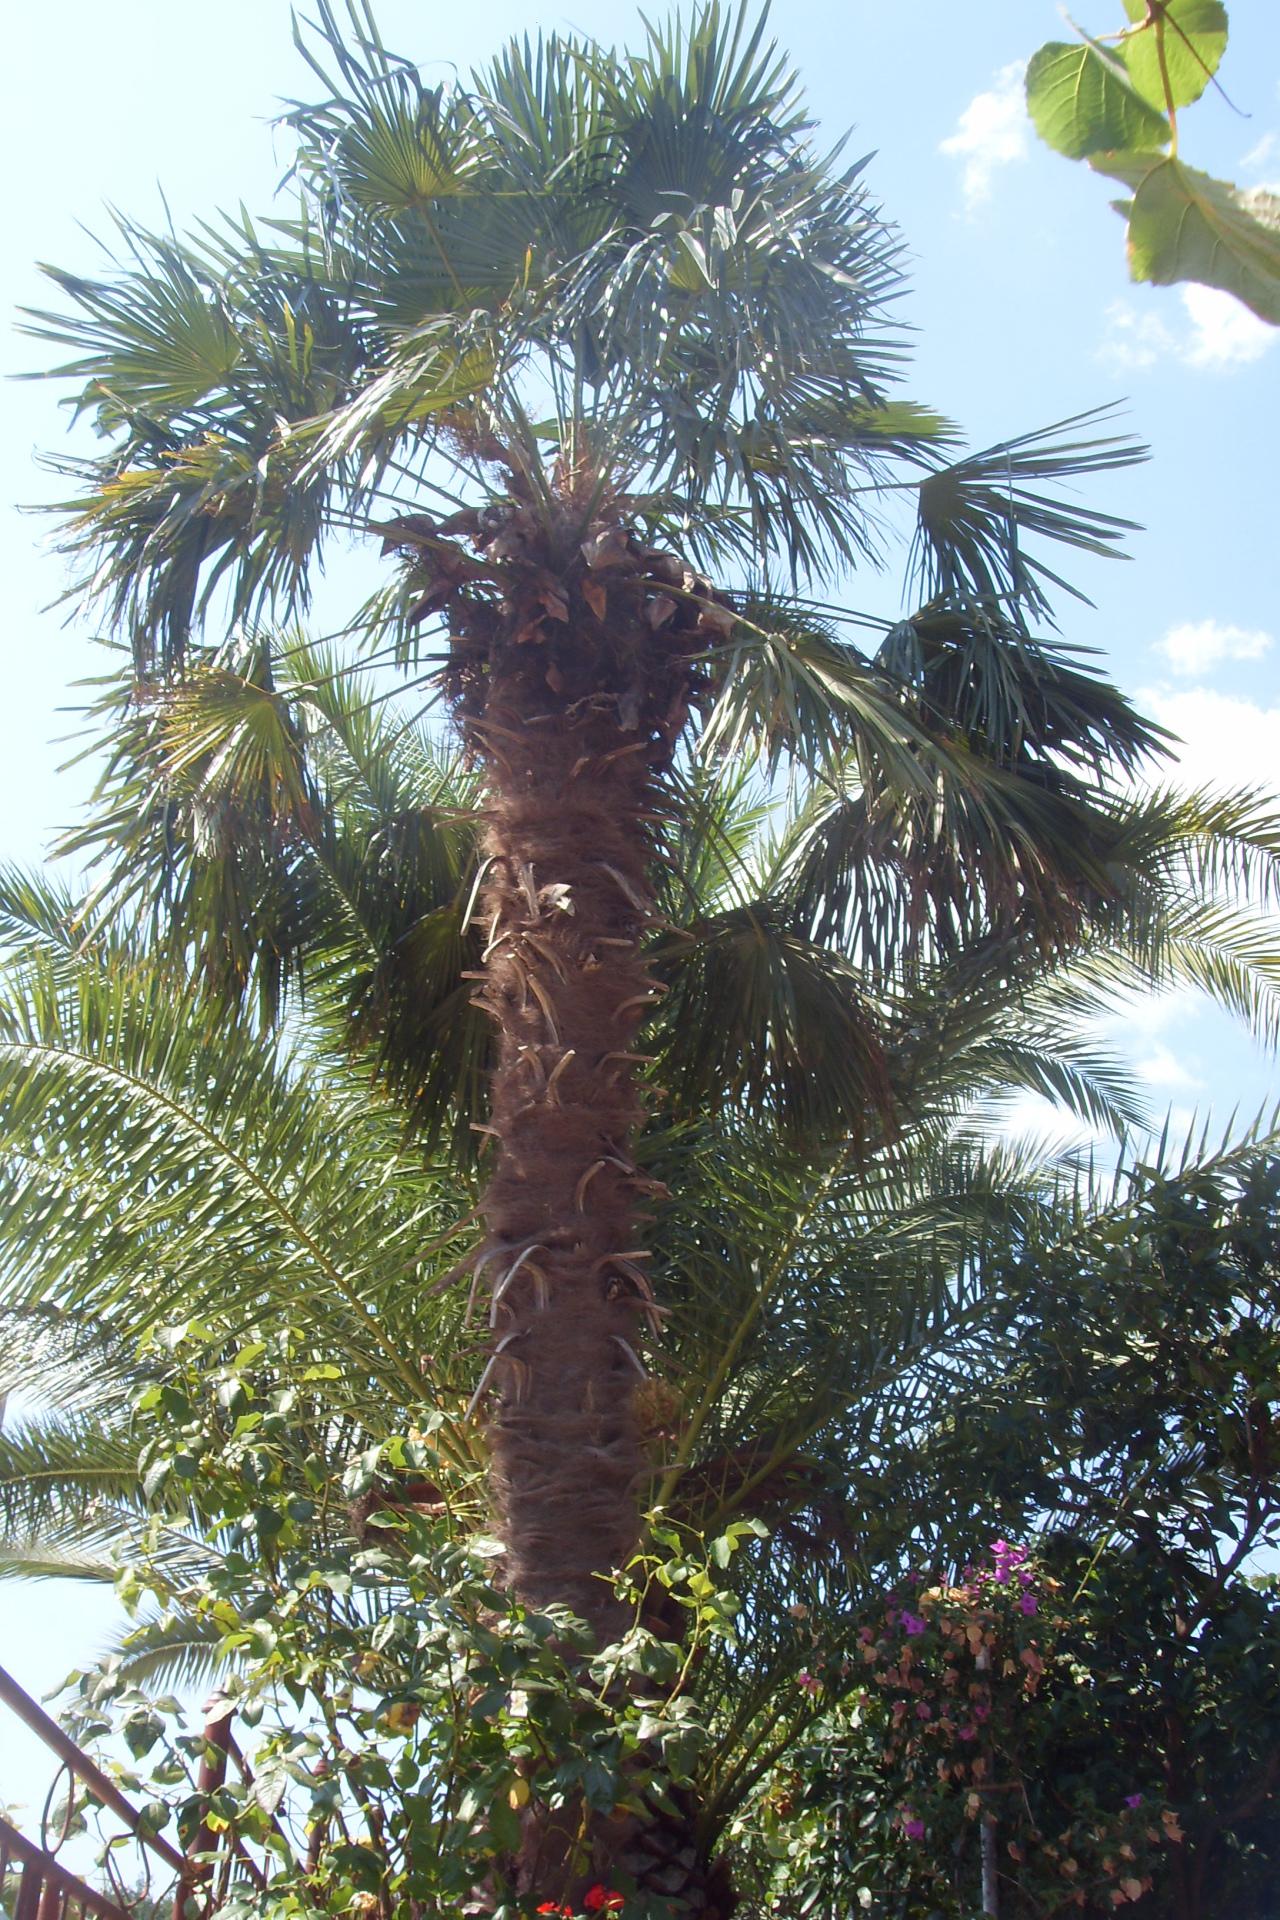 Palma tzv. Kineska vetrenjača (Trachycarpus fortuneii)